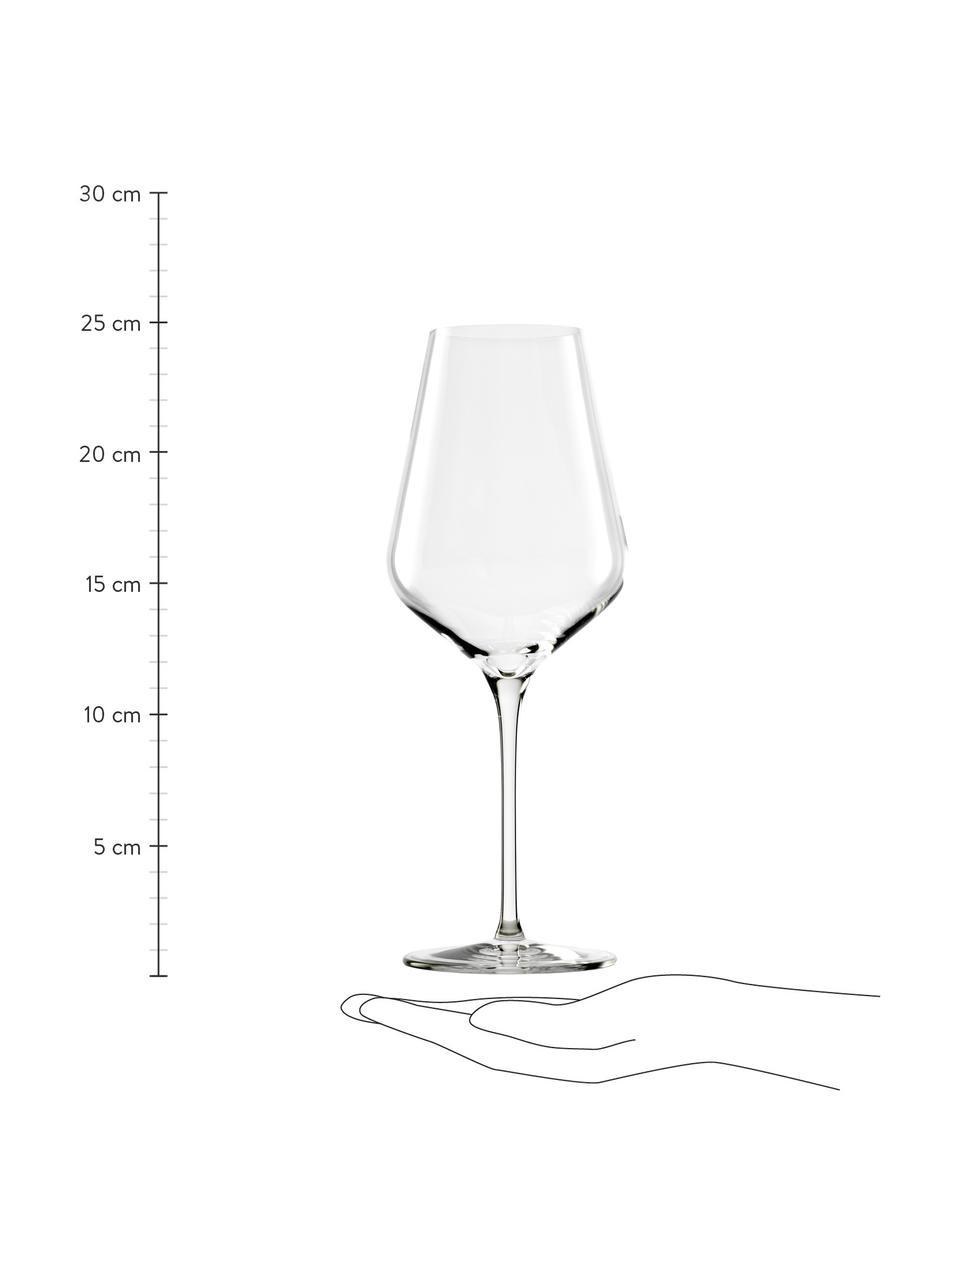 Kristallen rode wijnglazenset Quatrophil, 6-delig, Kristalglas, Transparant, Ø 10 x H 25 cm